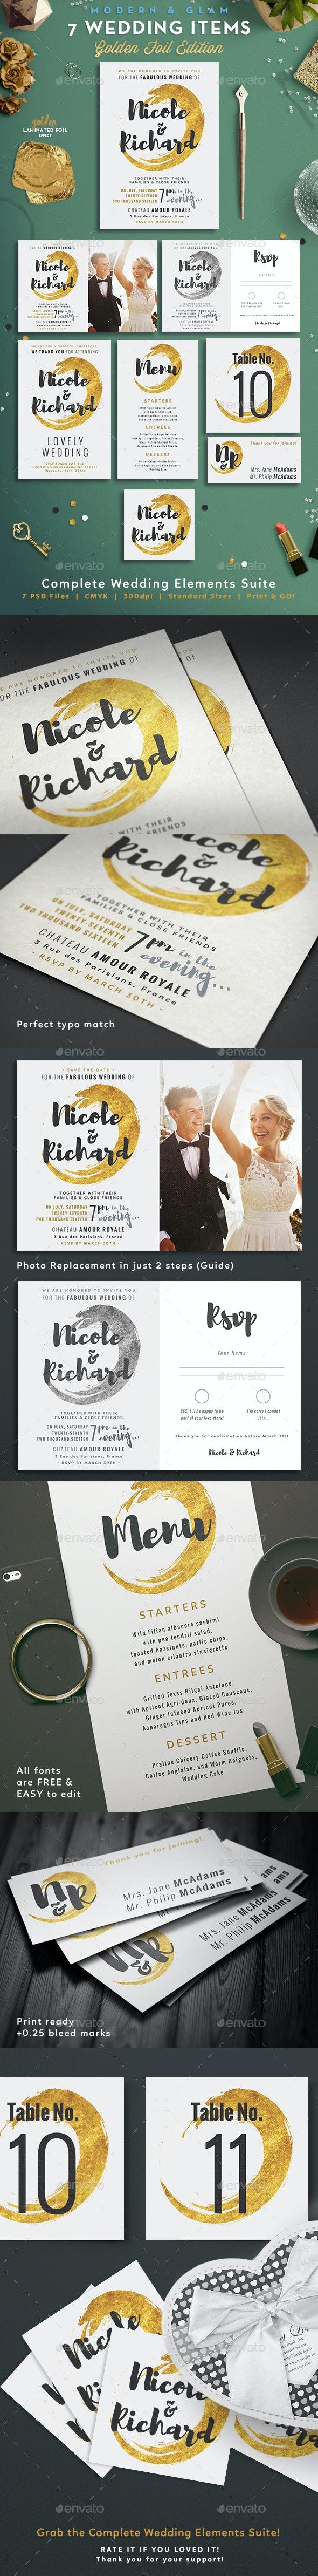 7 Golden Foil Items - Wedding Pack - Weddings Cards & Invites